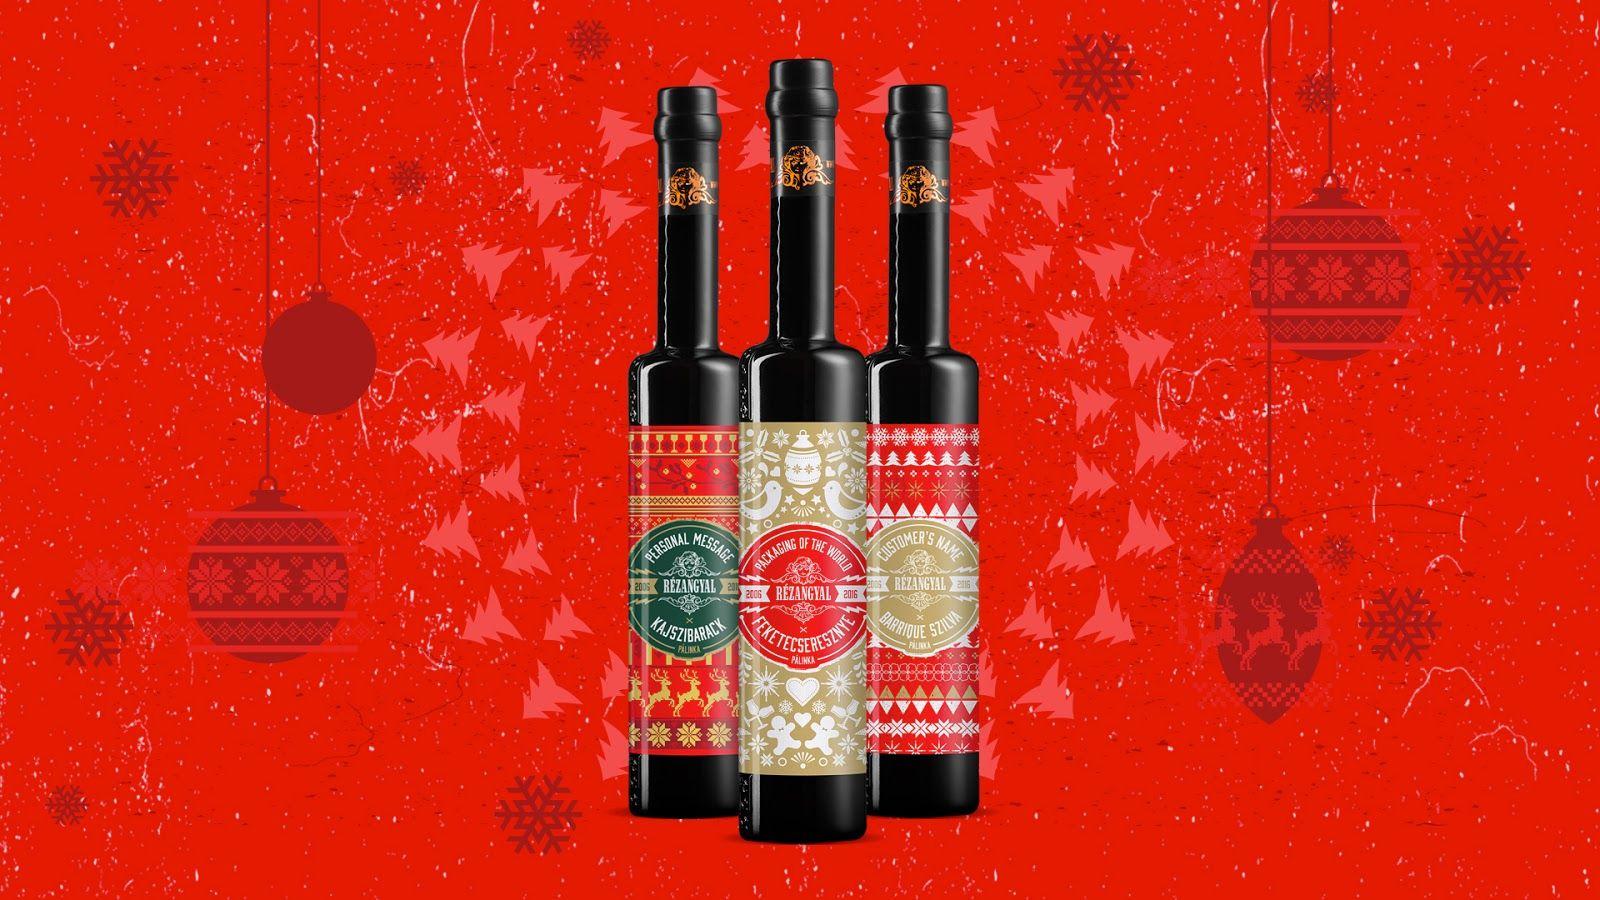 Rezangyal X Mas Labels With Personal Message Packaging Design Inspiration Bottle Design Packaging Design